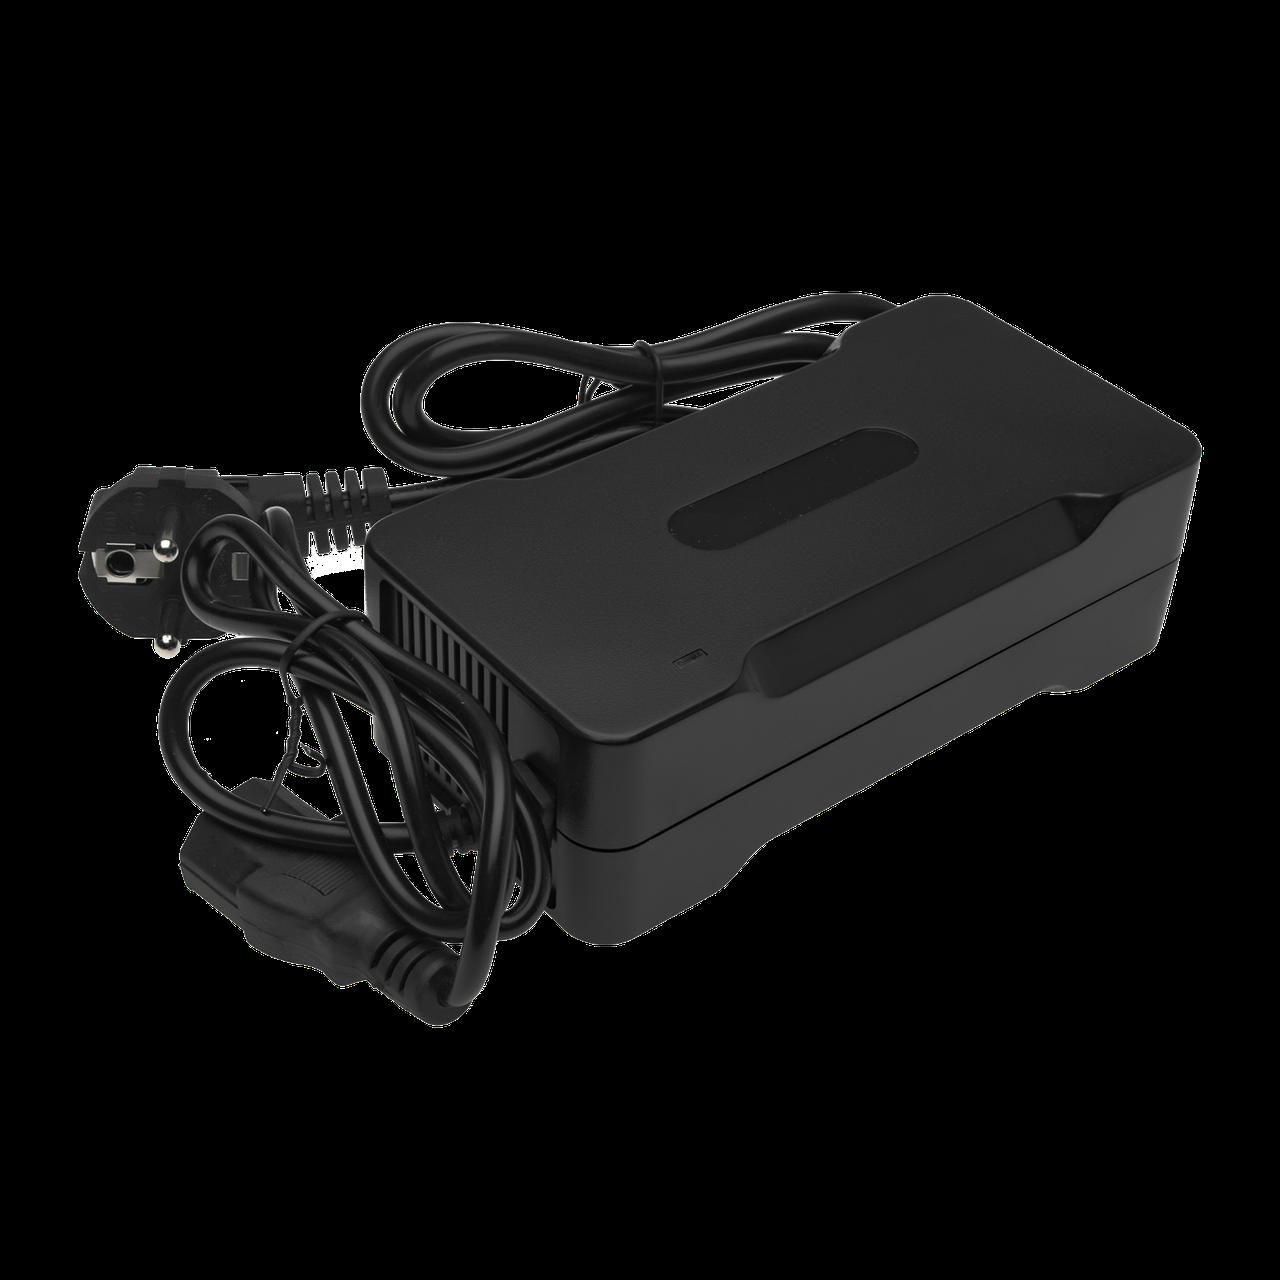 Зарядное устройство для аккумуляторов 72V(87.6V)-2A-144W